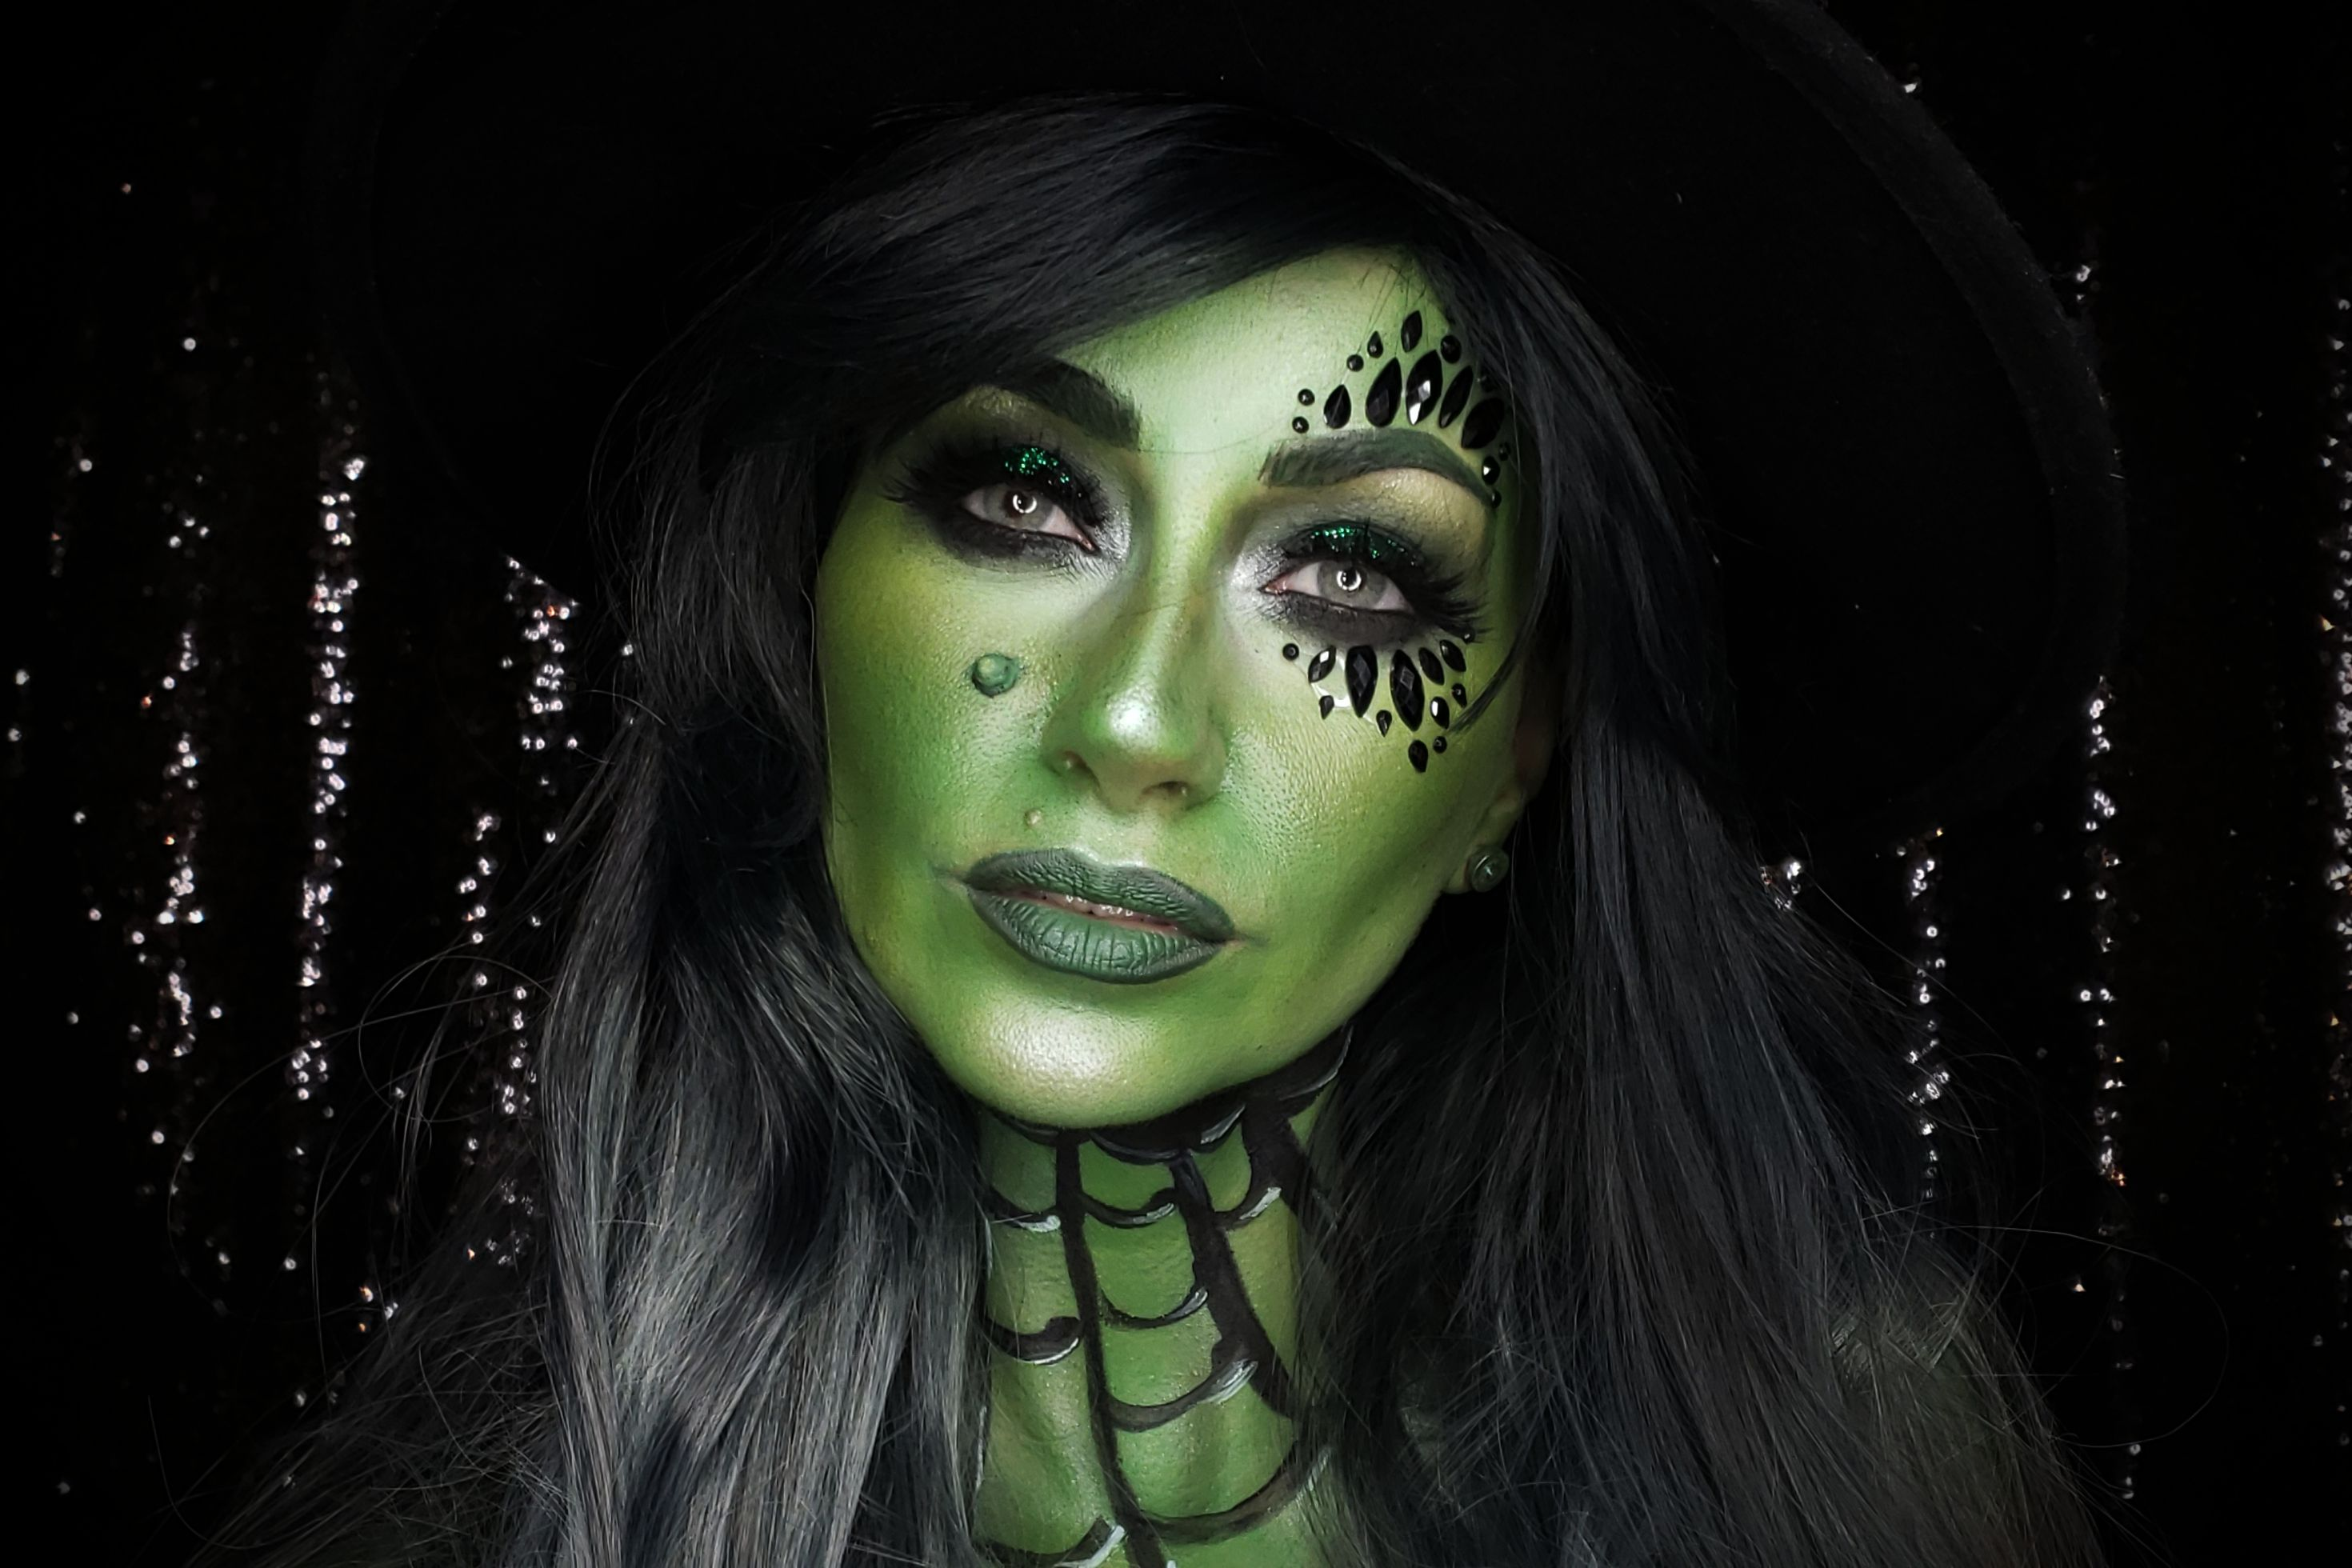 Butterfly Girl Hd Wallpaper Green Witch Makeup Tutorial Mehron